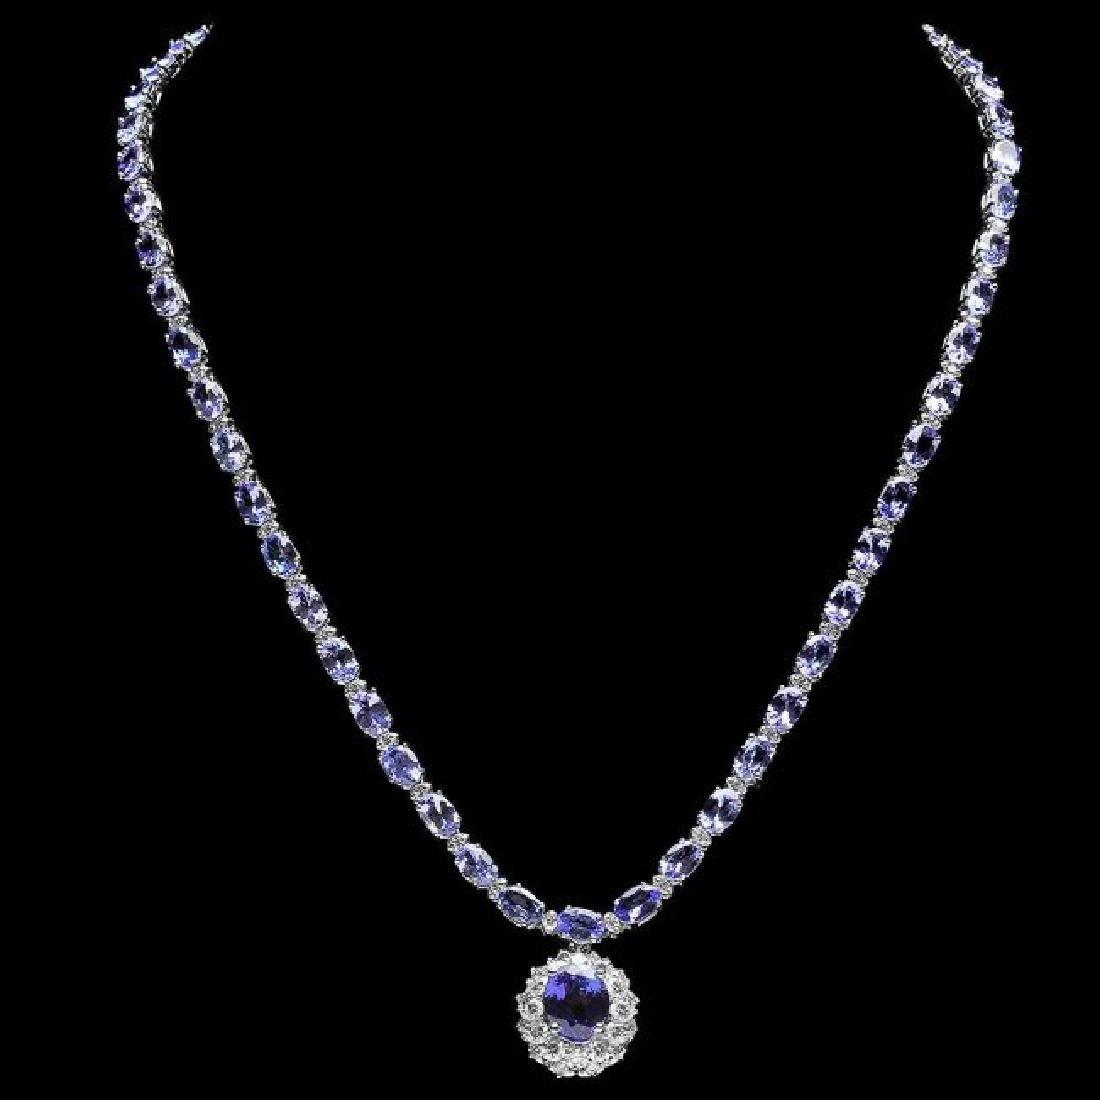 14k Gold 25.5ct Tanzanite 3.00ct Diamond Necklace - 2